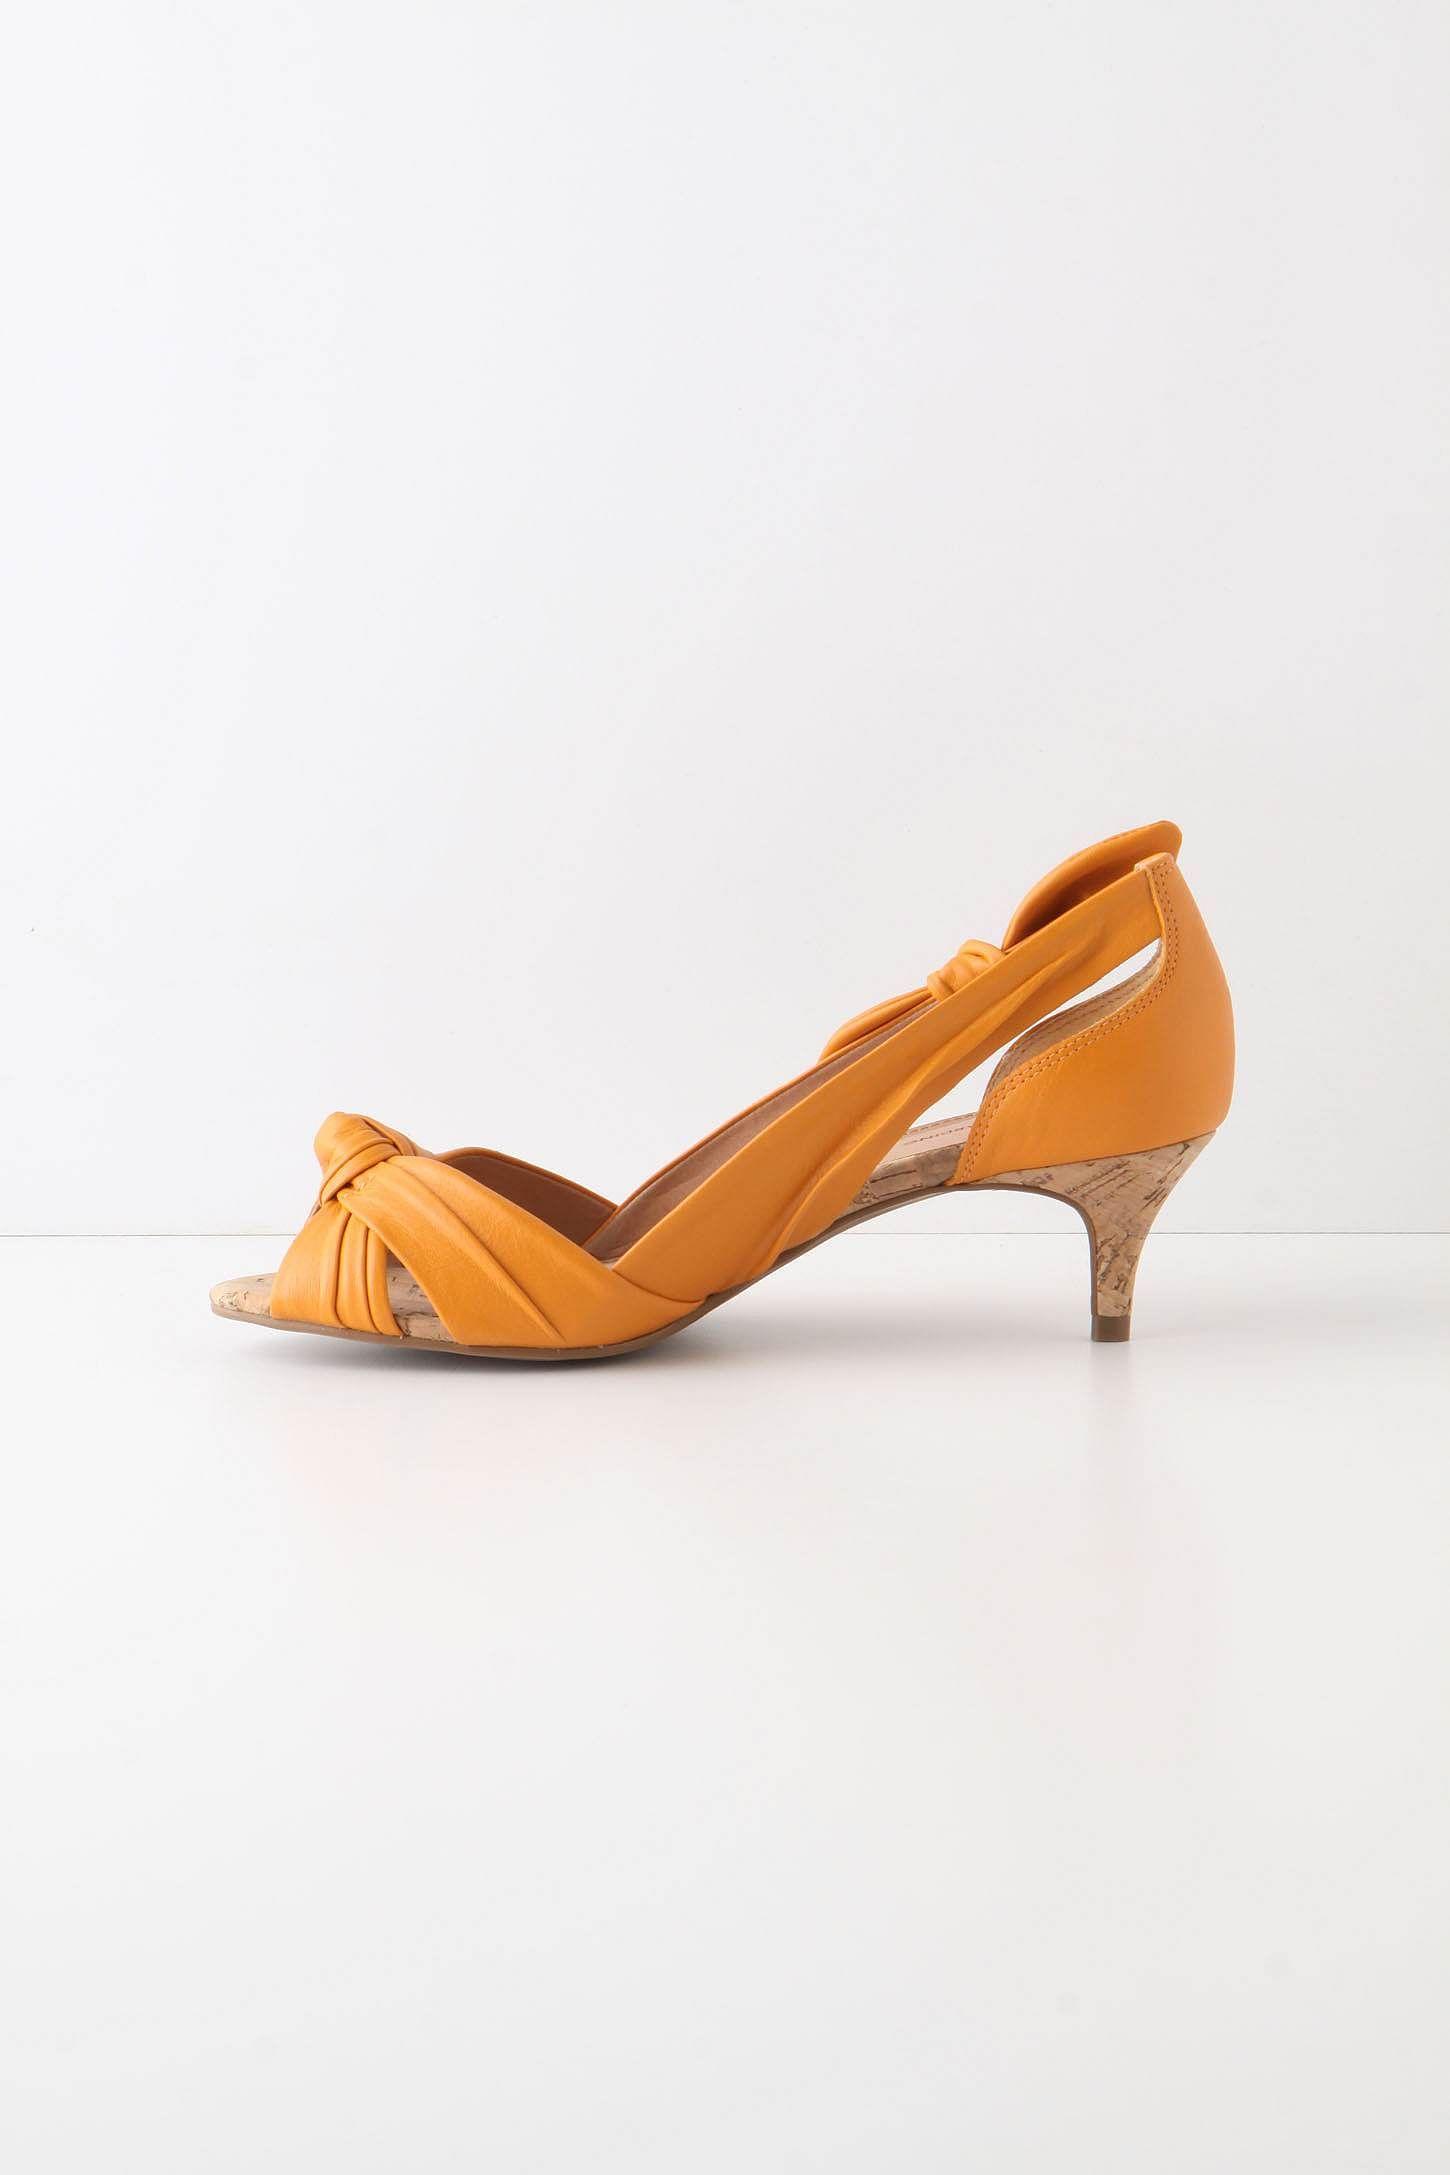 b21b4d2253b if i wore heels...